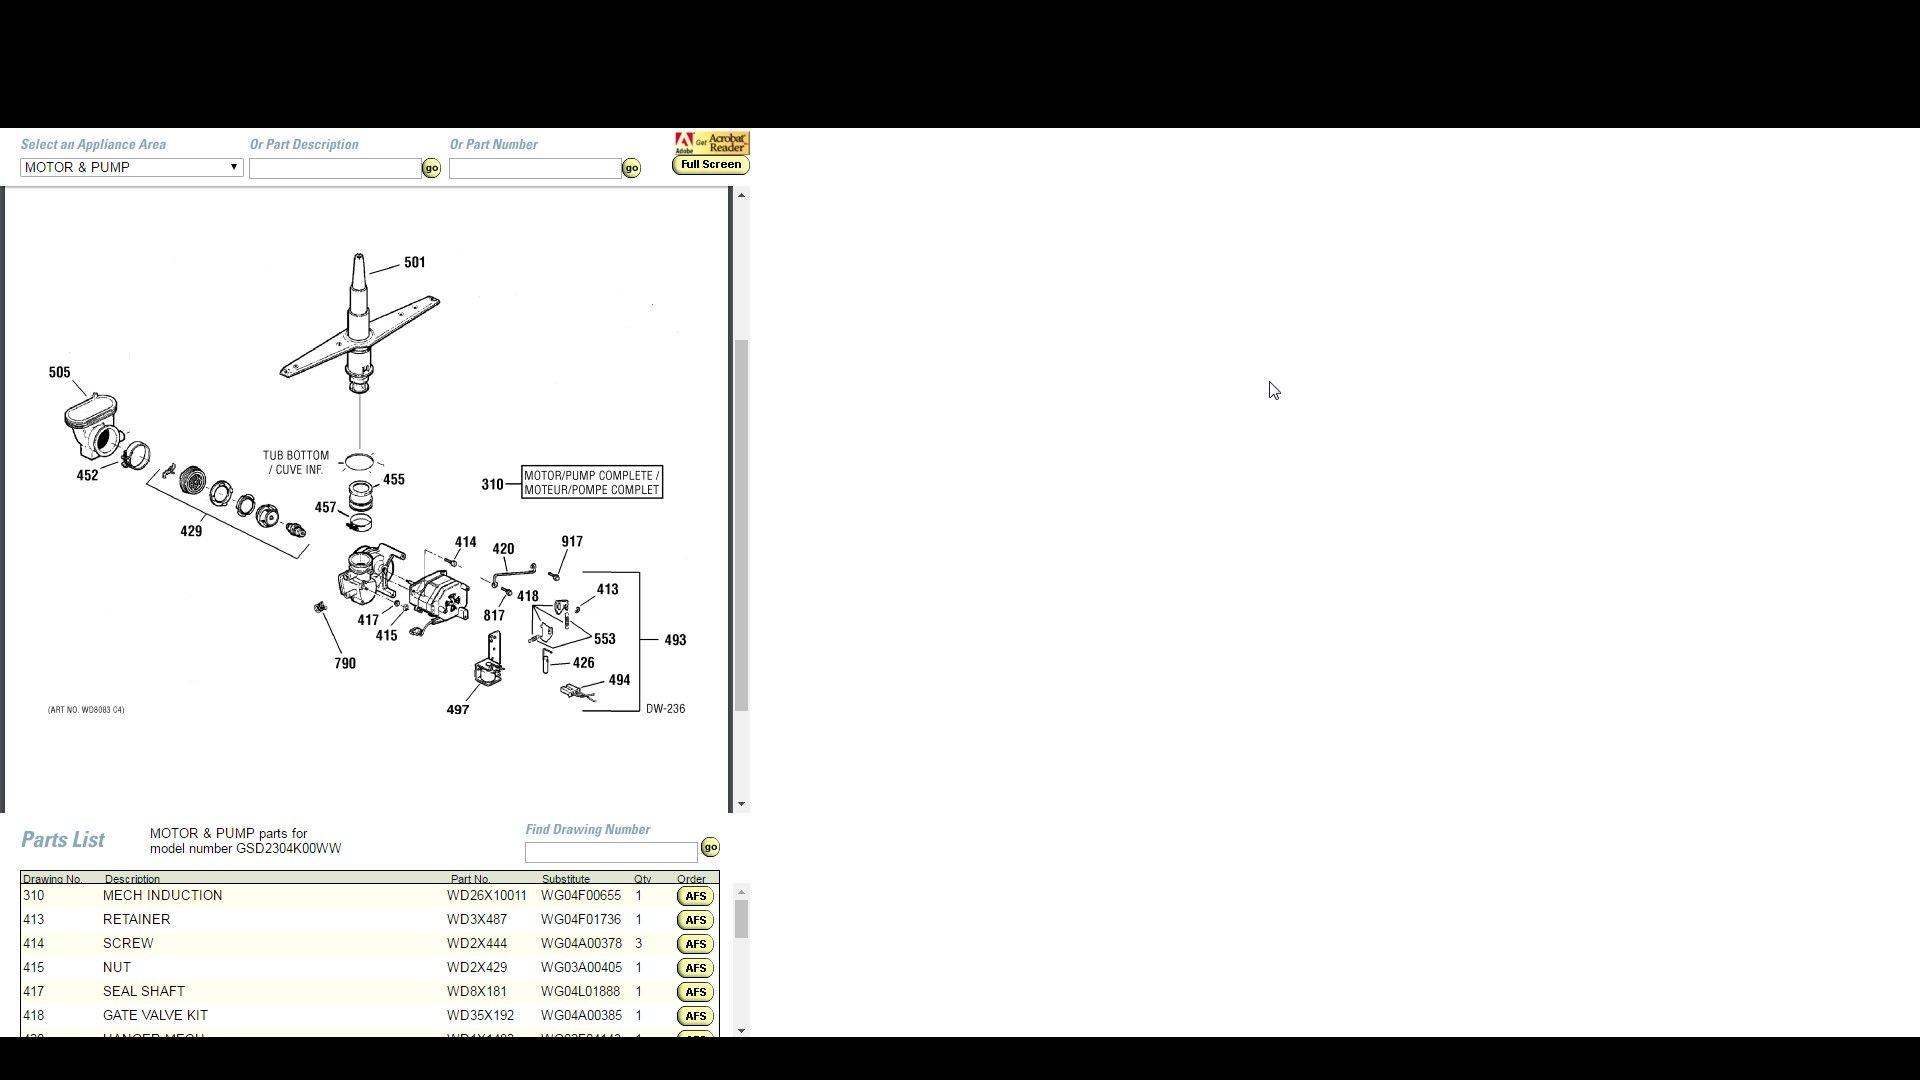 f5b7c7e5-cedf-412d-a8e2-0c33eee9e0e5_ScreenHunter_2033 Mar. 27 10.45.jpg